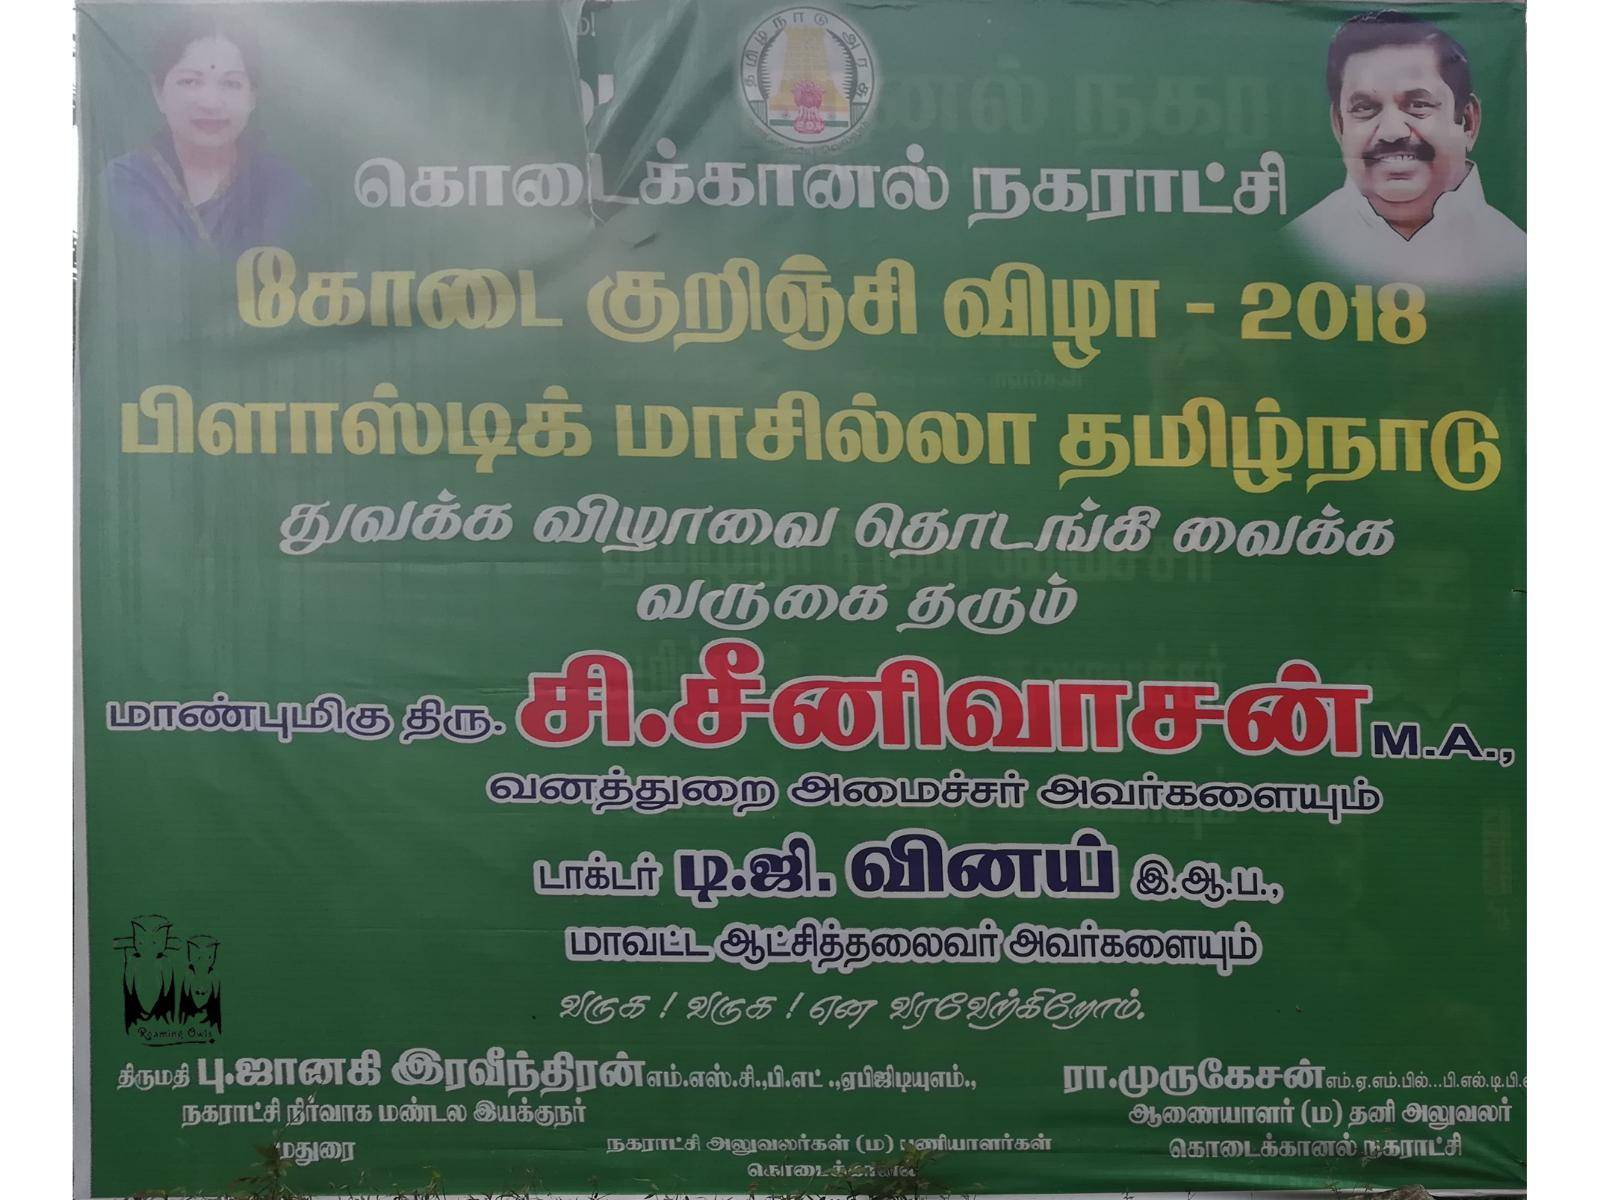 Tamilnadu Government Banners,Kodaikanal Kurinji Festival,Kodaikanal Summer Festival